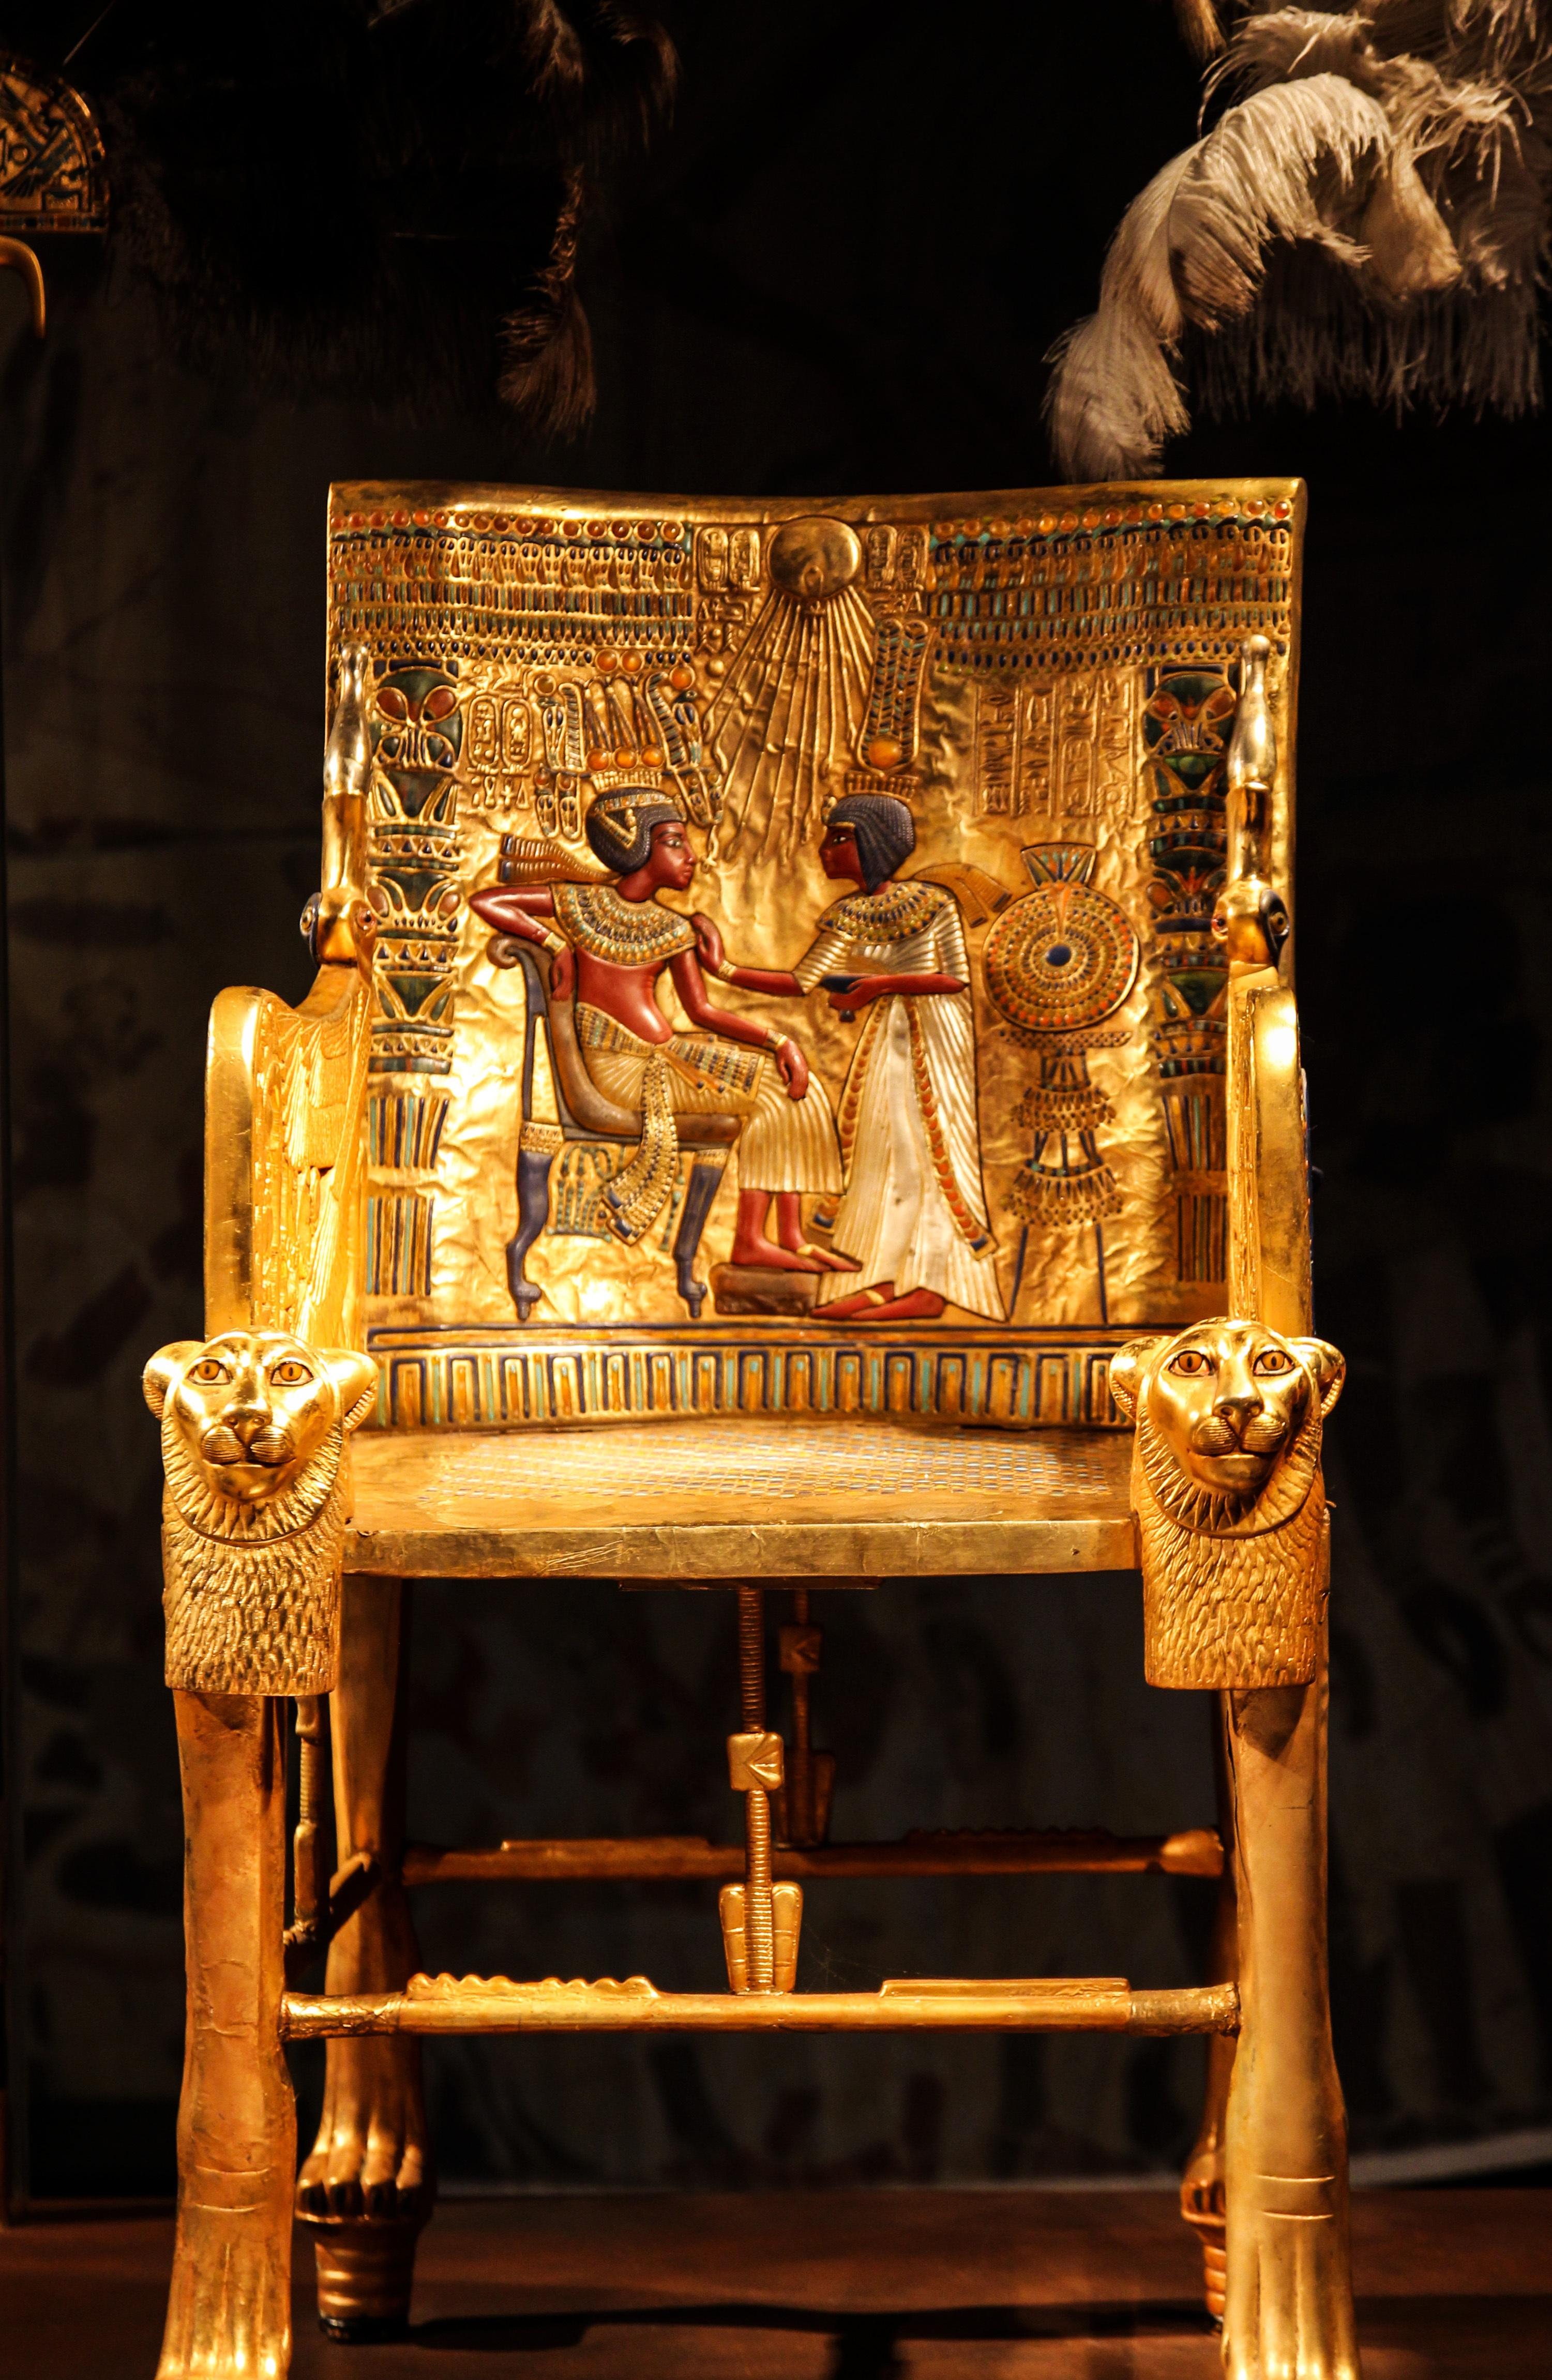 Fotos Gratis Madera Silla Dorado Mueble Egipto Teatro Art  # Muebles Dorados